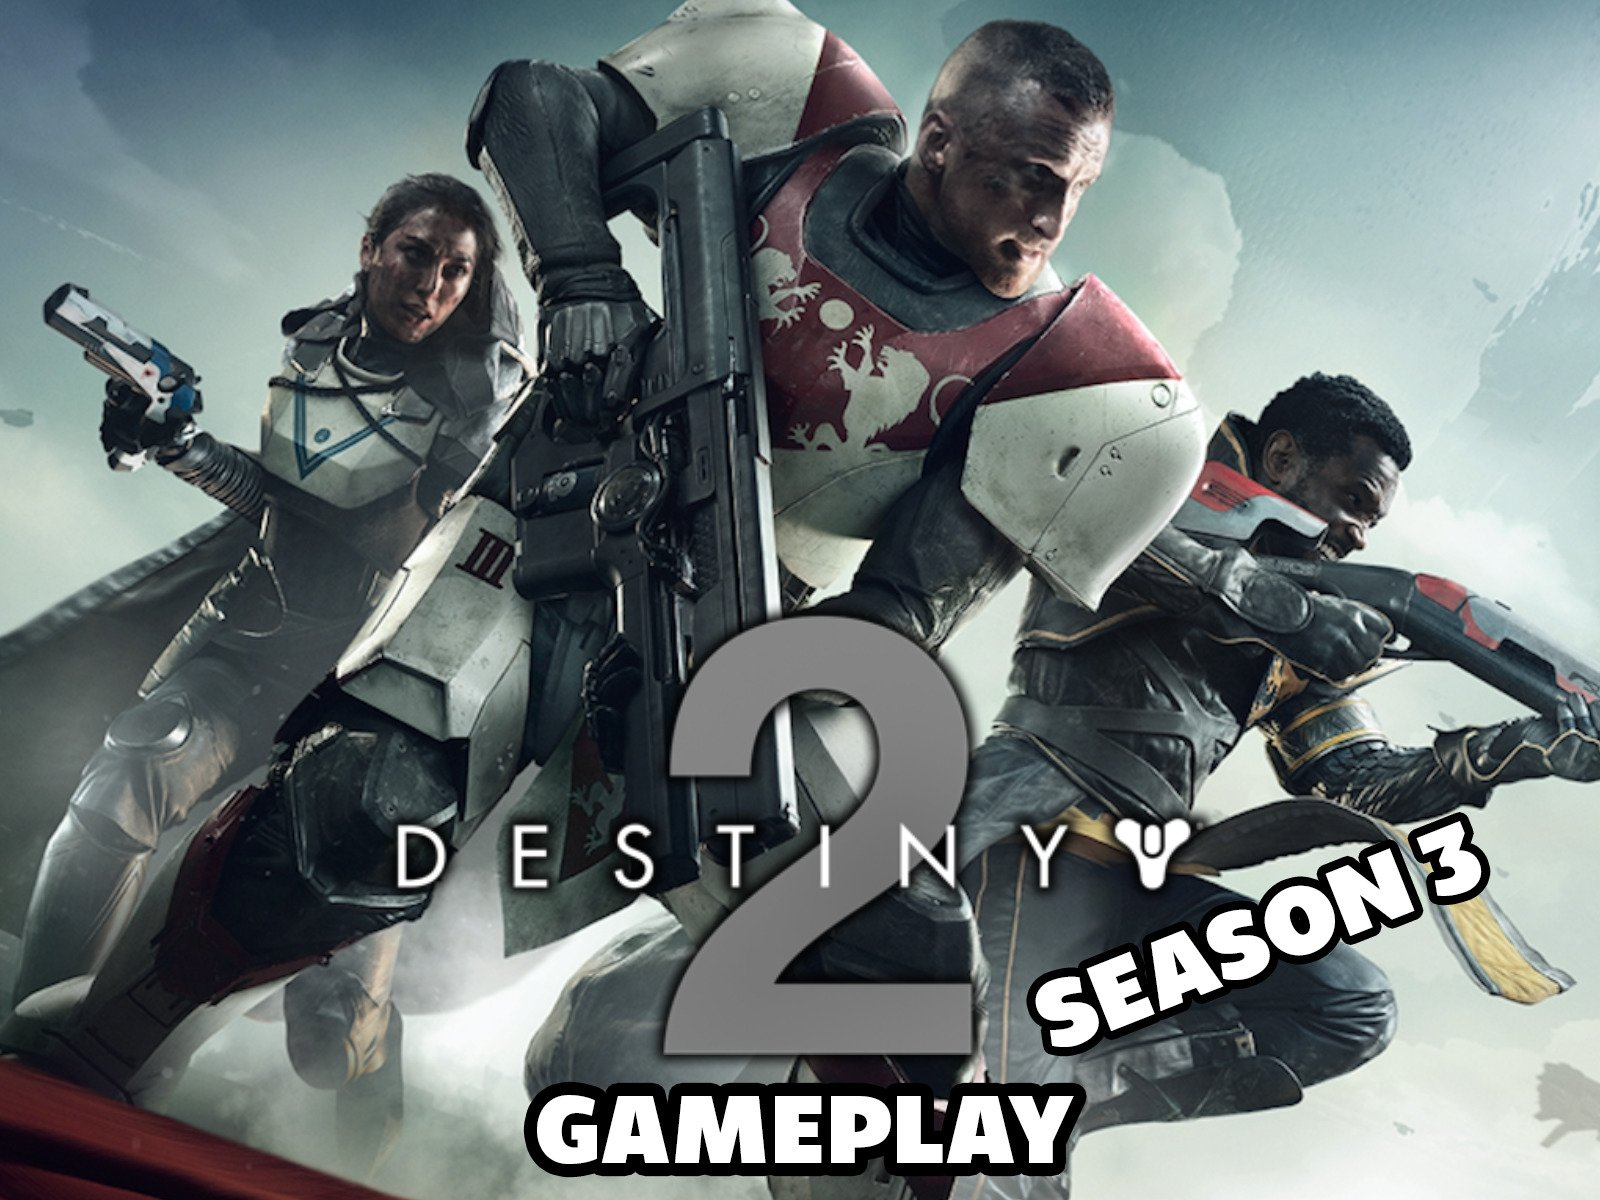 Clip: Destiny 2 Gameplay - Season 3